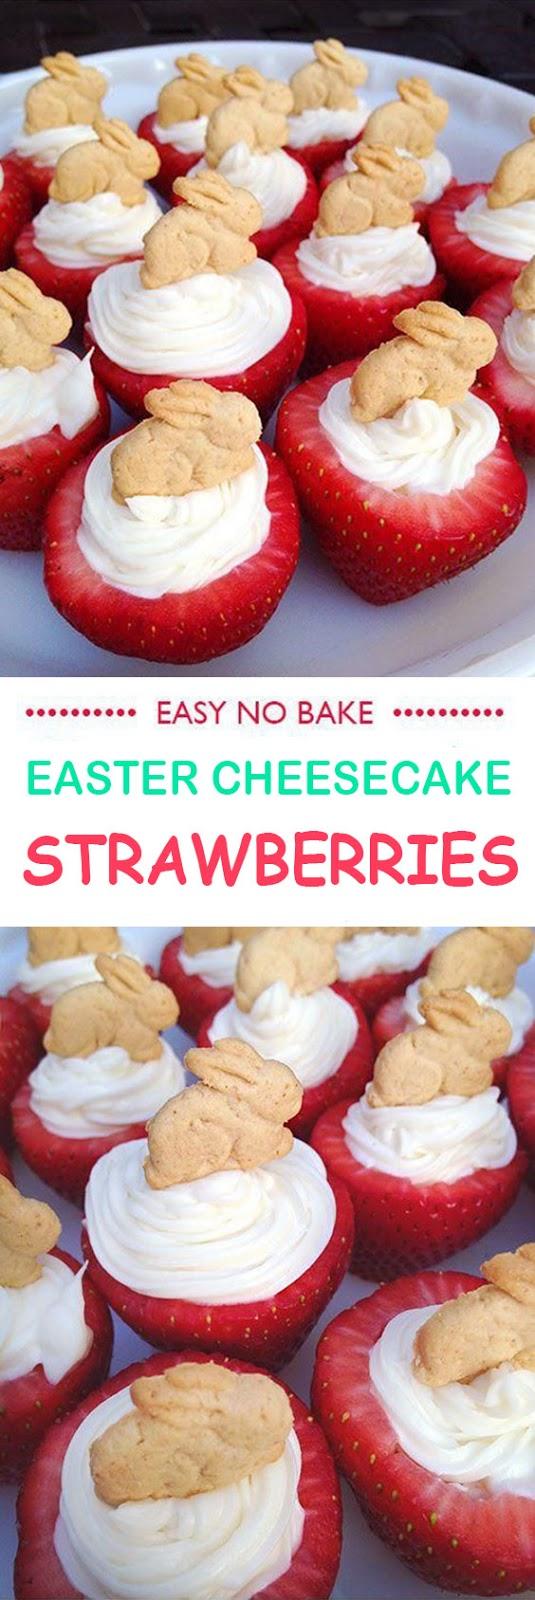 Easy No Bake Easter Cheesecake Strawberries